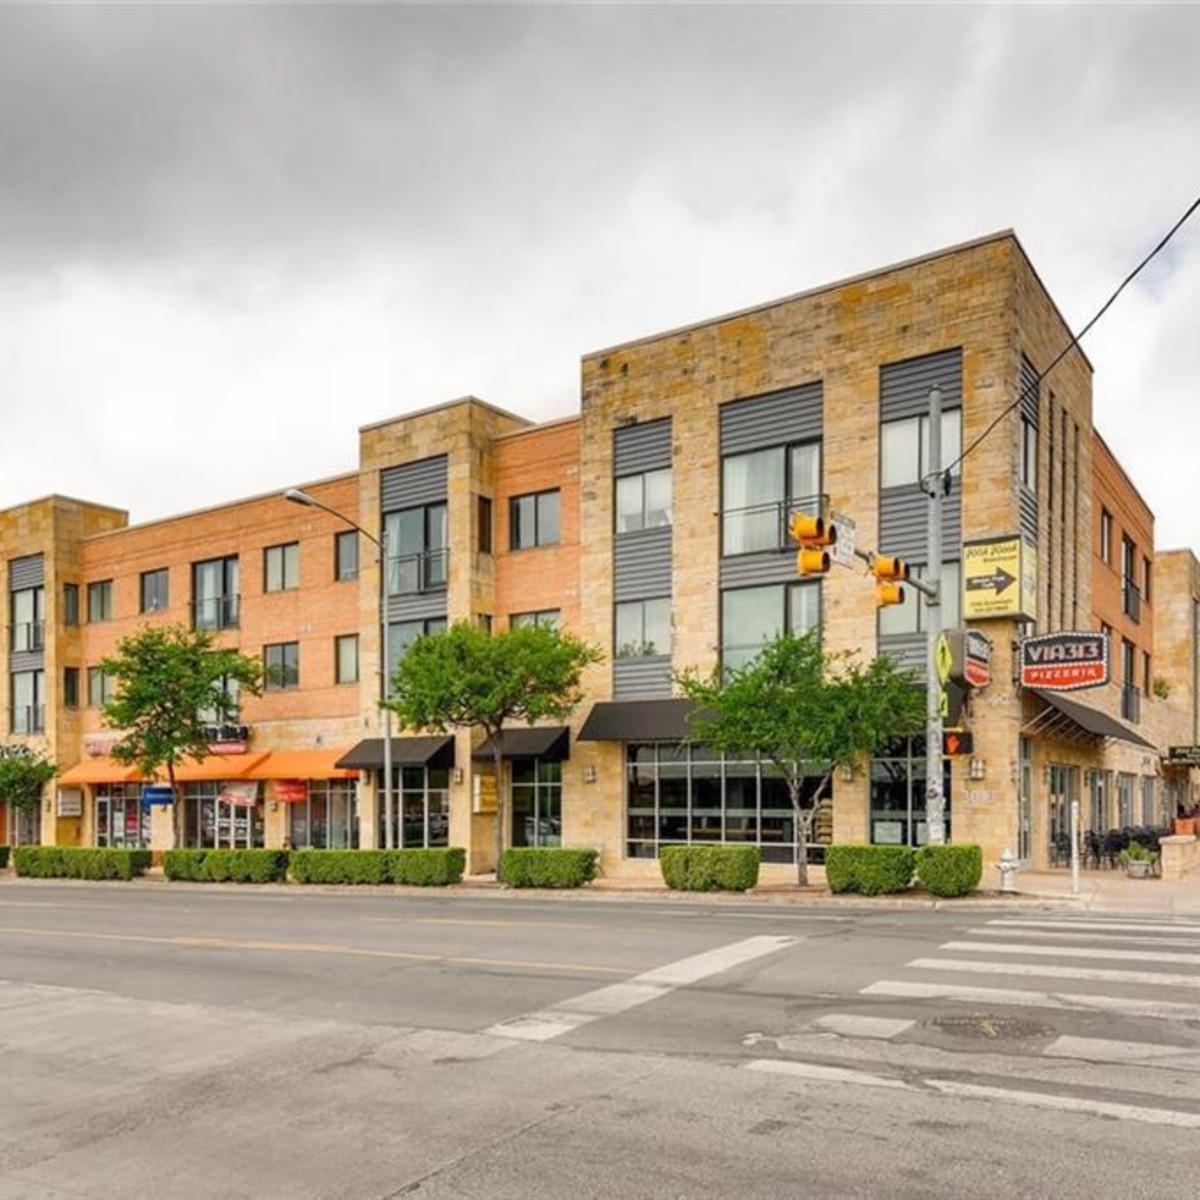 Guadalupe Via 313 building exterior